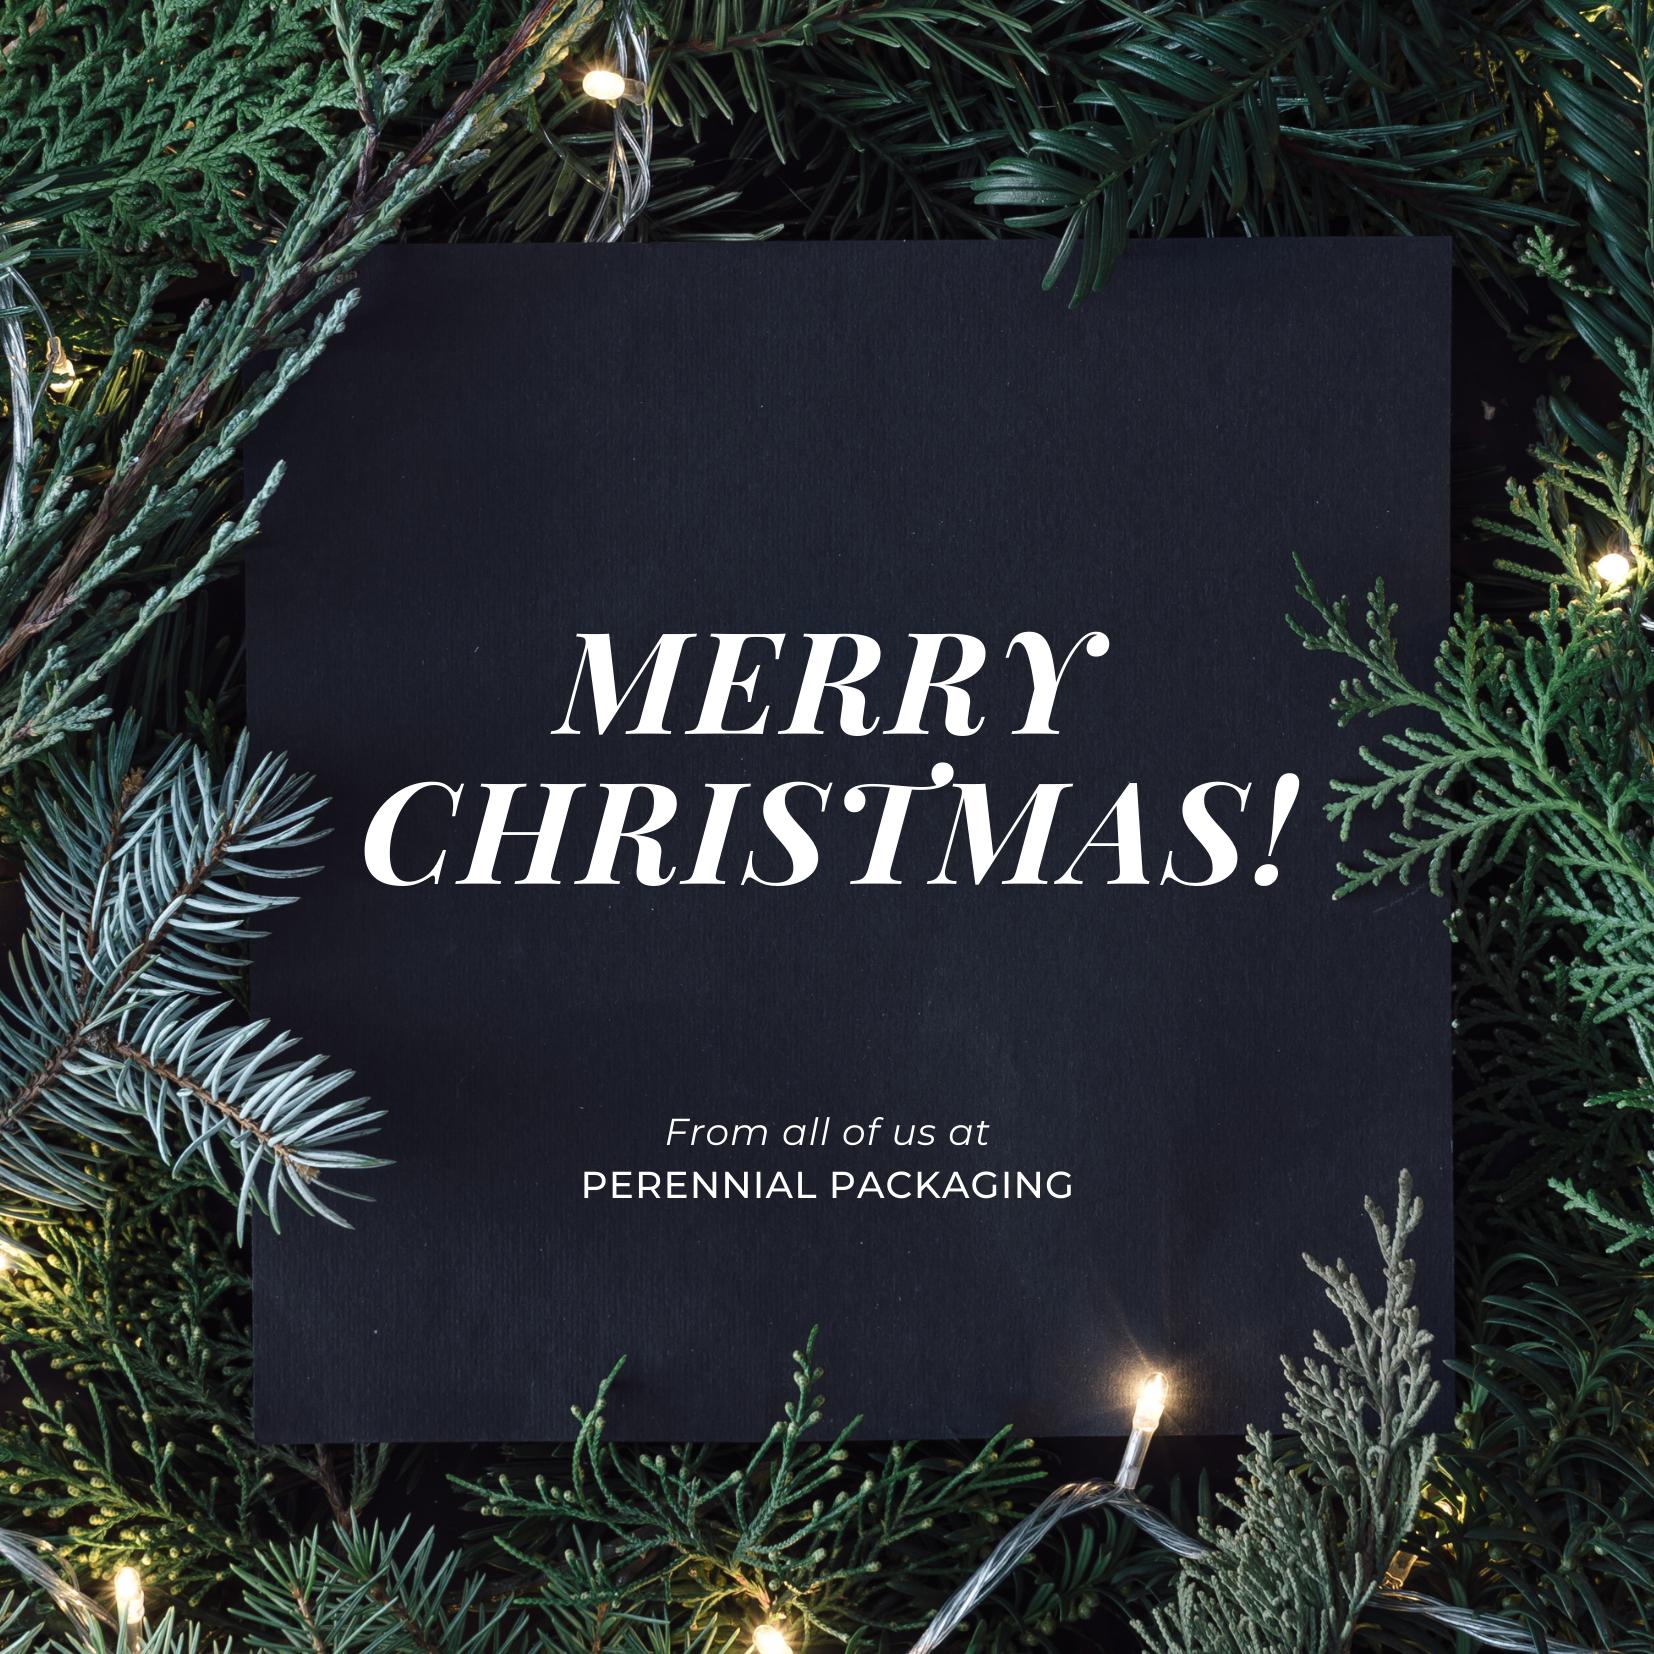 Perennial Christmas 2020